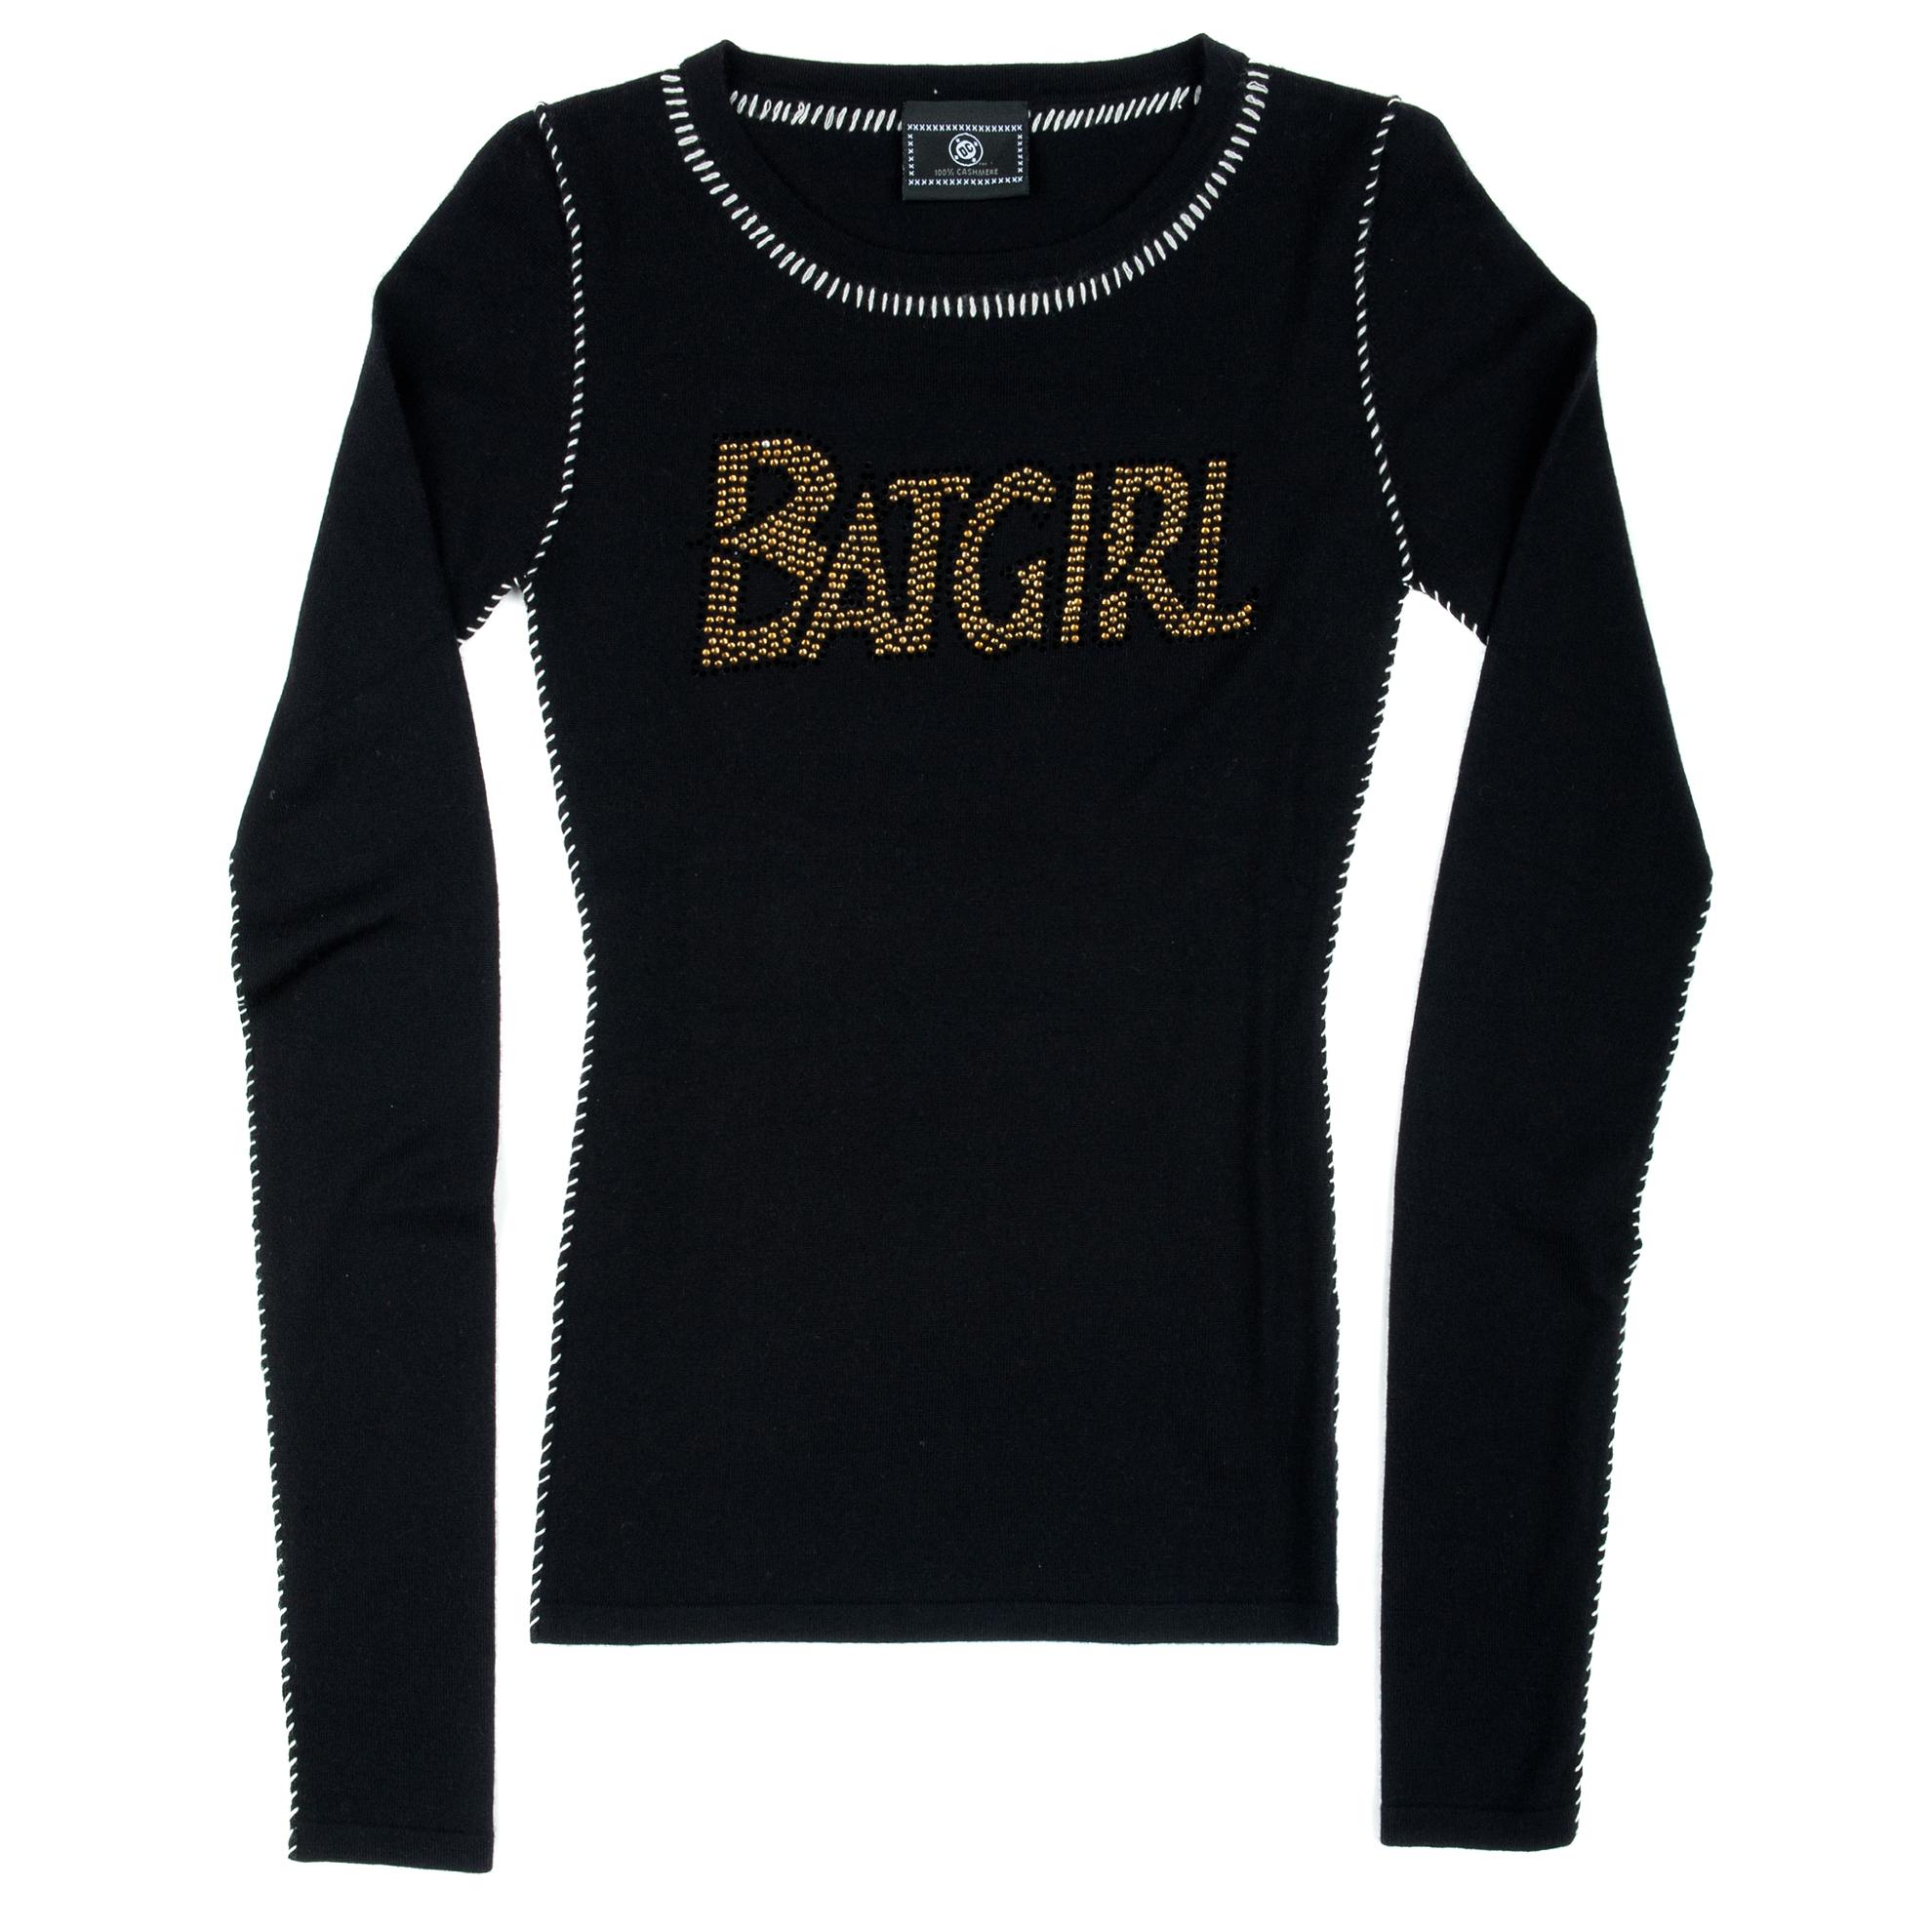 15-PCSH167 DC Comics 100% Cashmere Yellow Beaded BATGIRL Designer Sweater Black